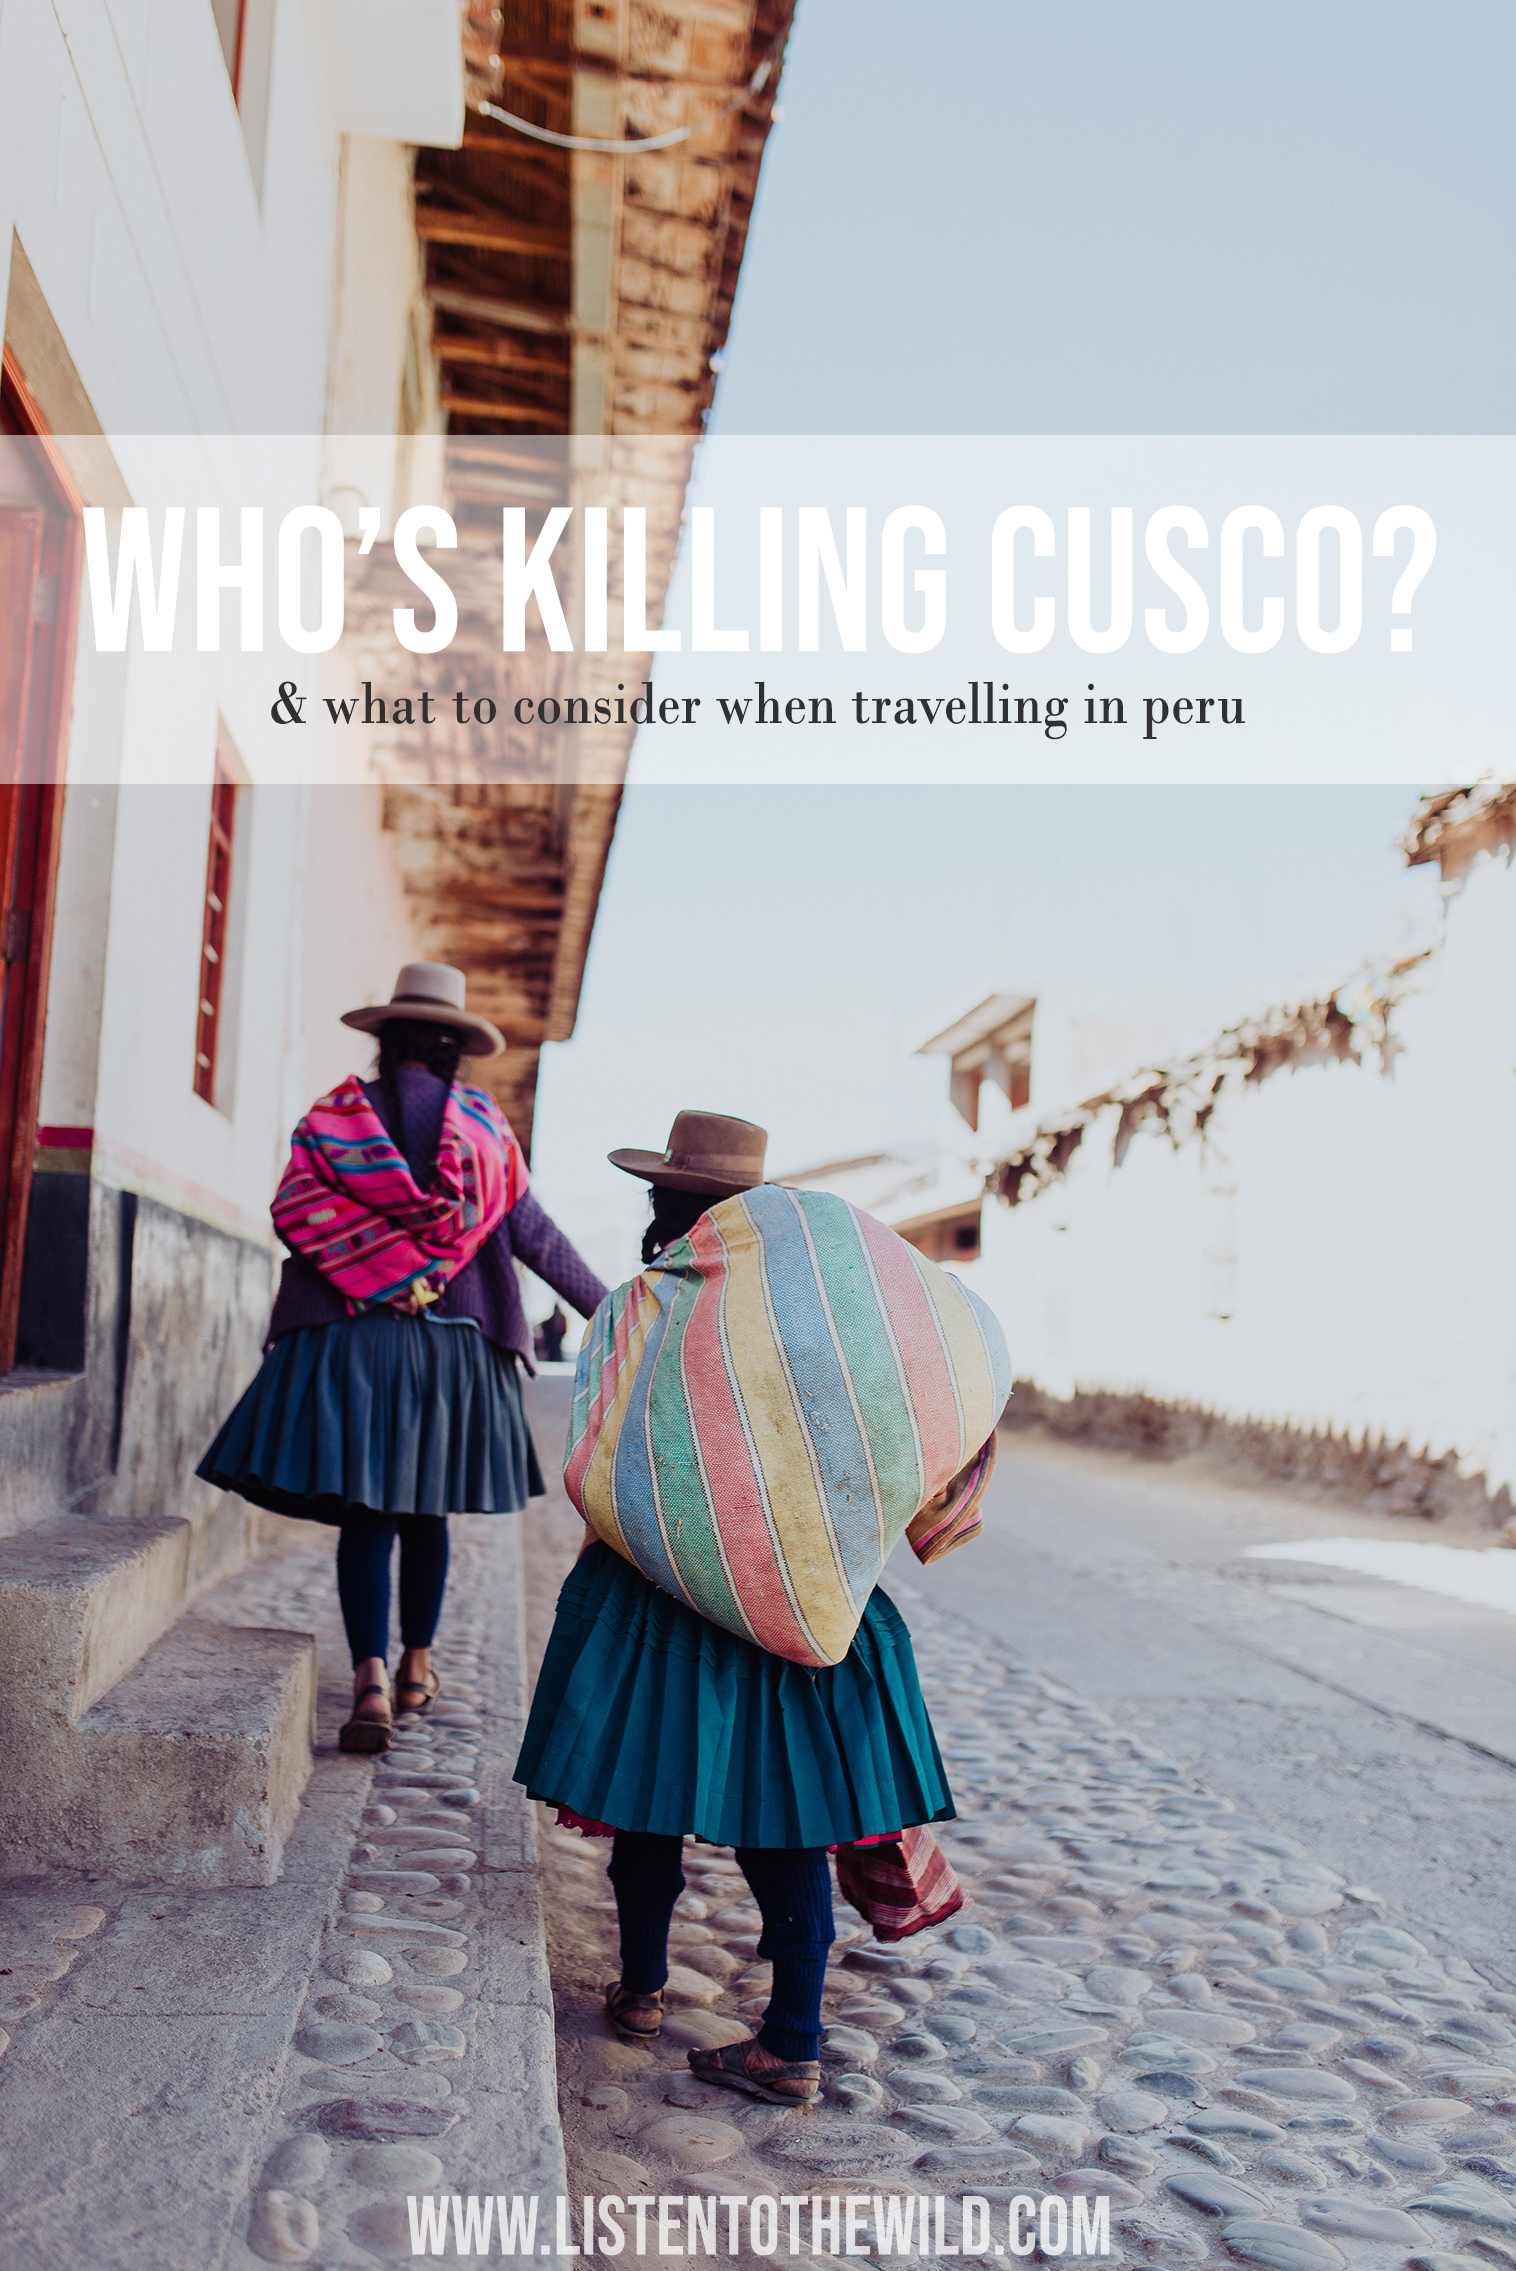 Travel blog, travel journalism, covering overtourism in Peru. Tourism and crowds in Peru, group tours to Peru, government restrictions Machu Picchu Cusco Peru